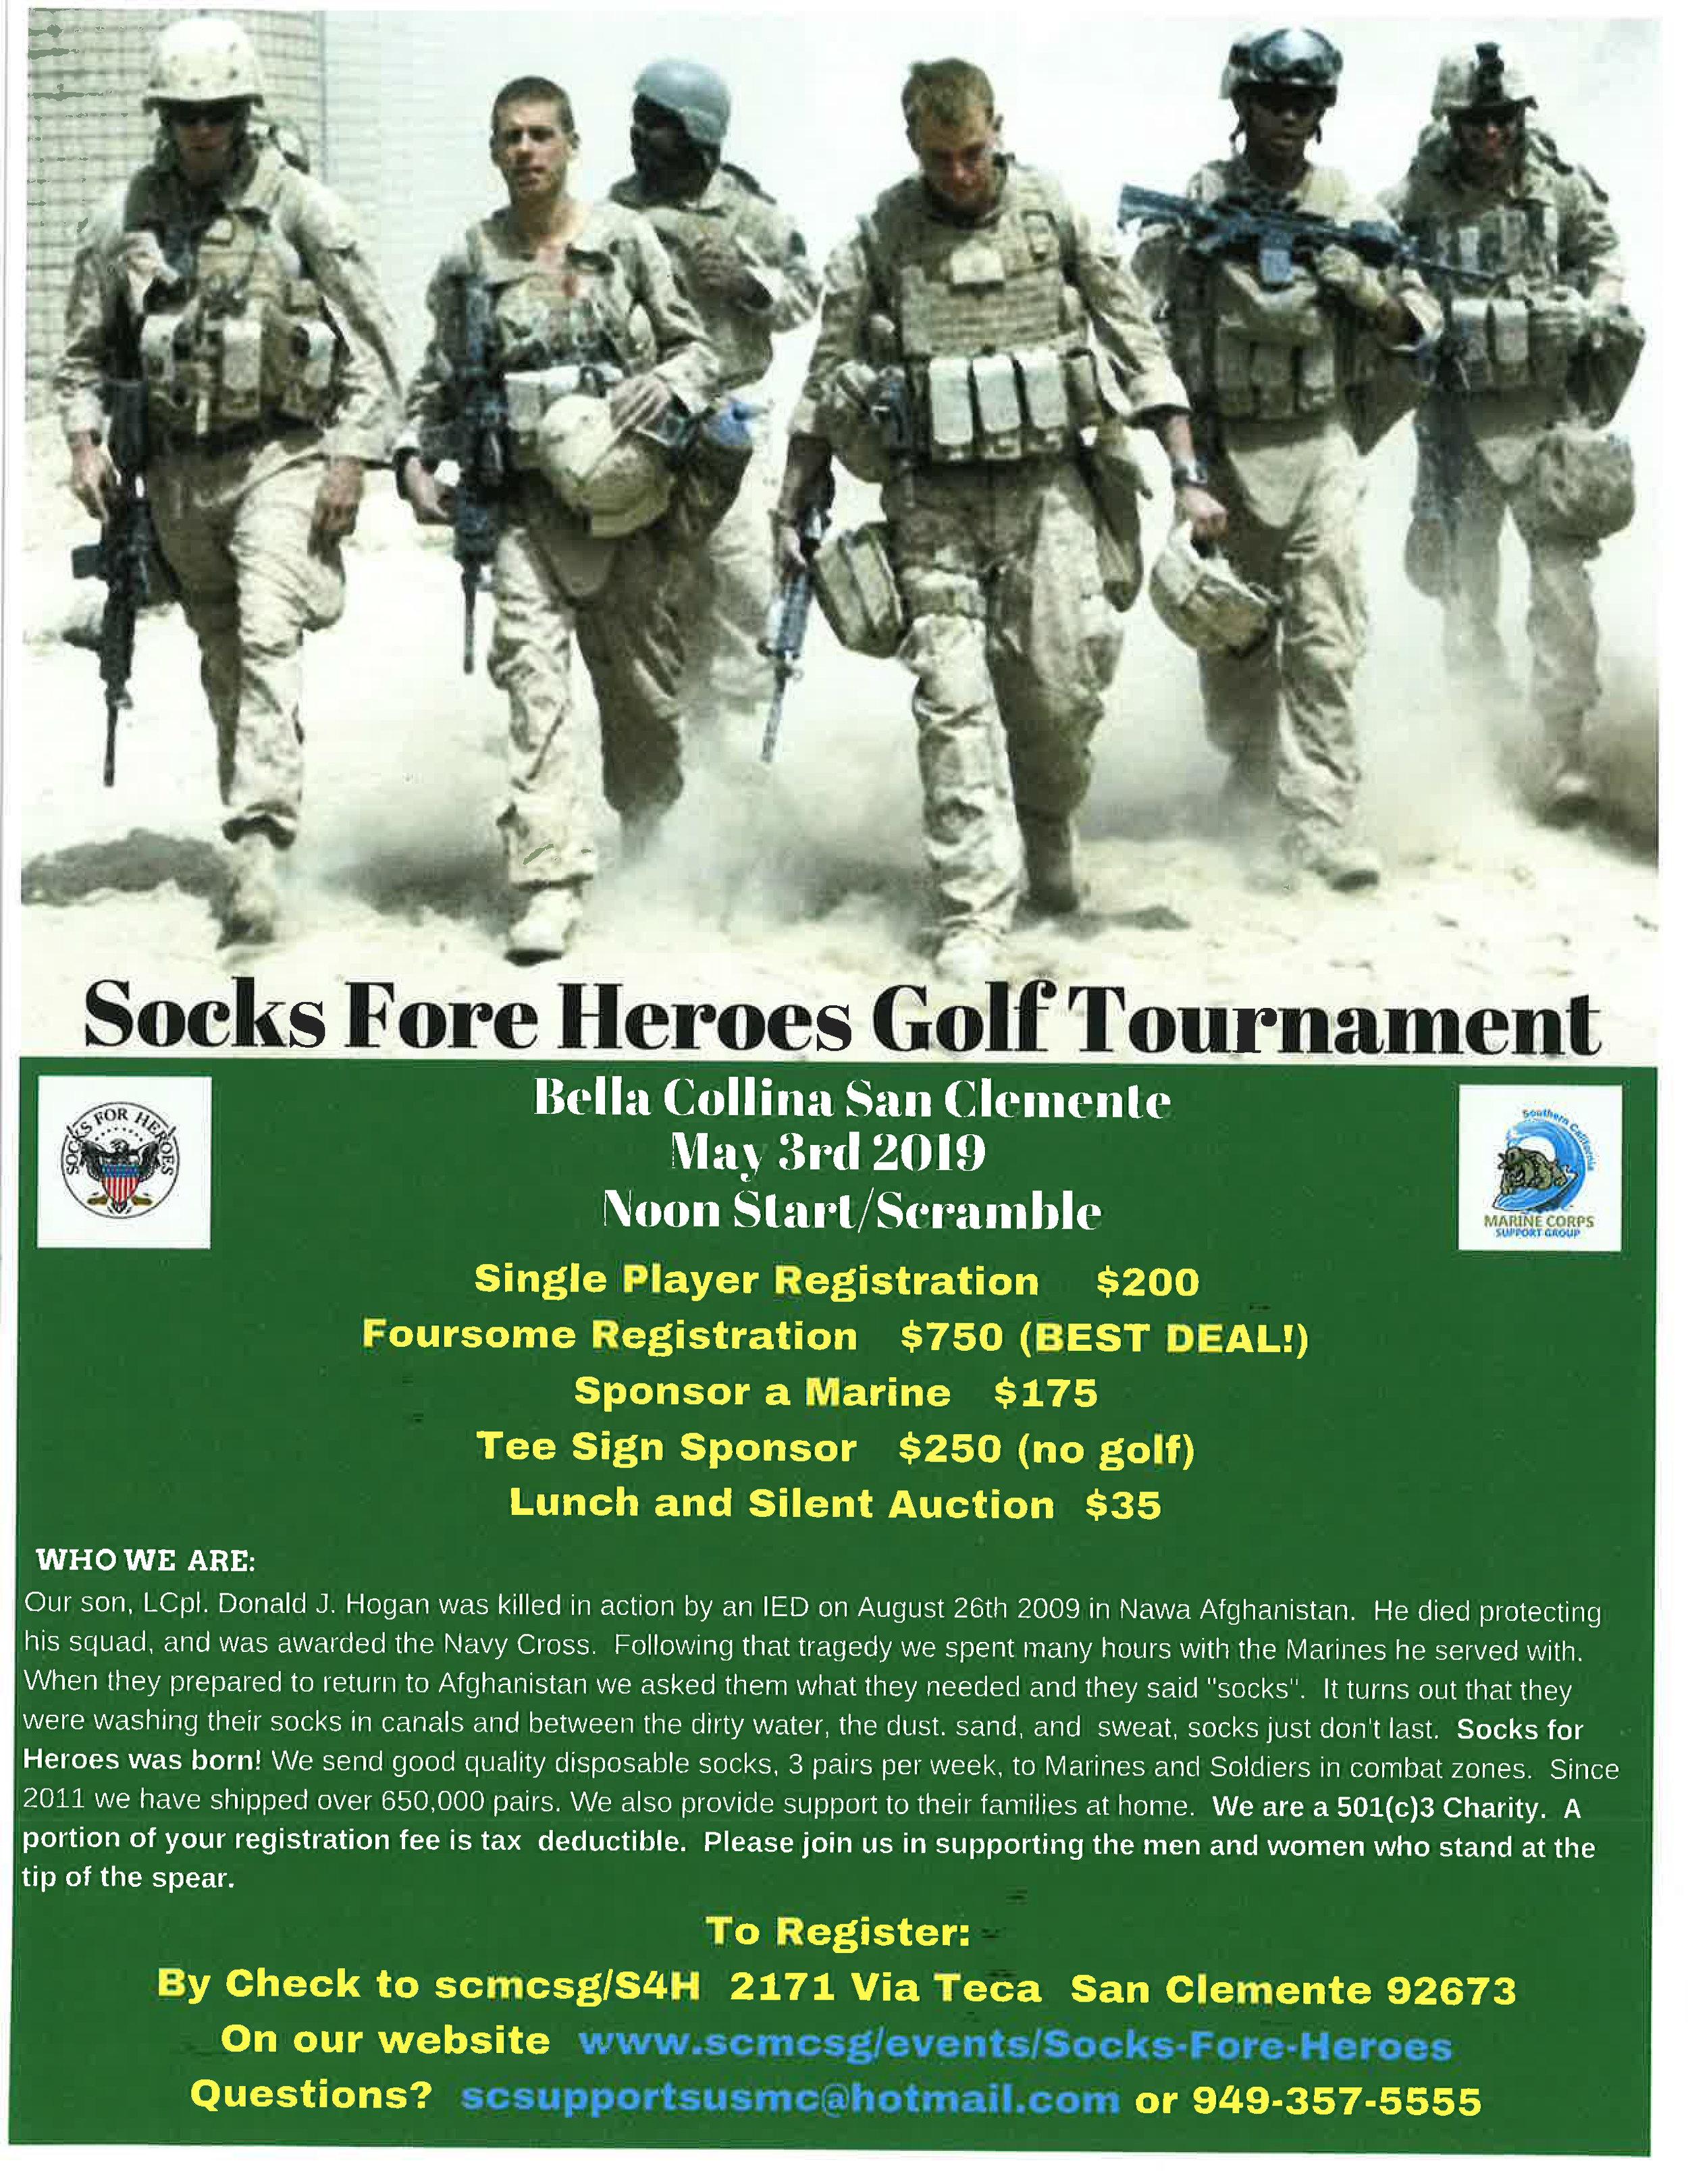 Socks Fore Heroes Golf Tournament Flyer.jpg